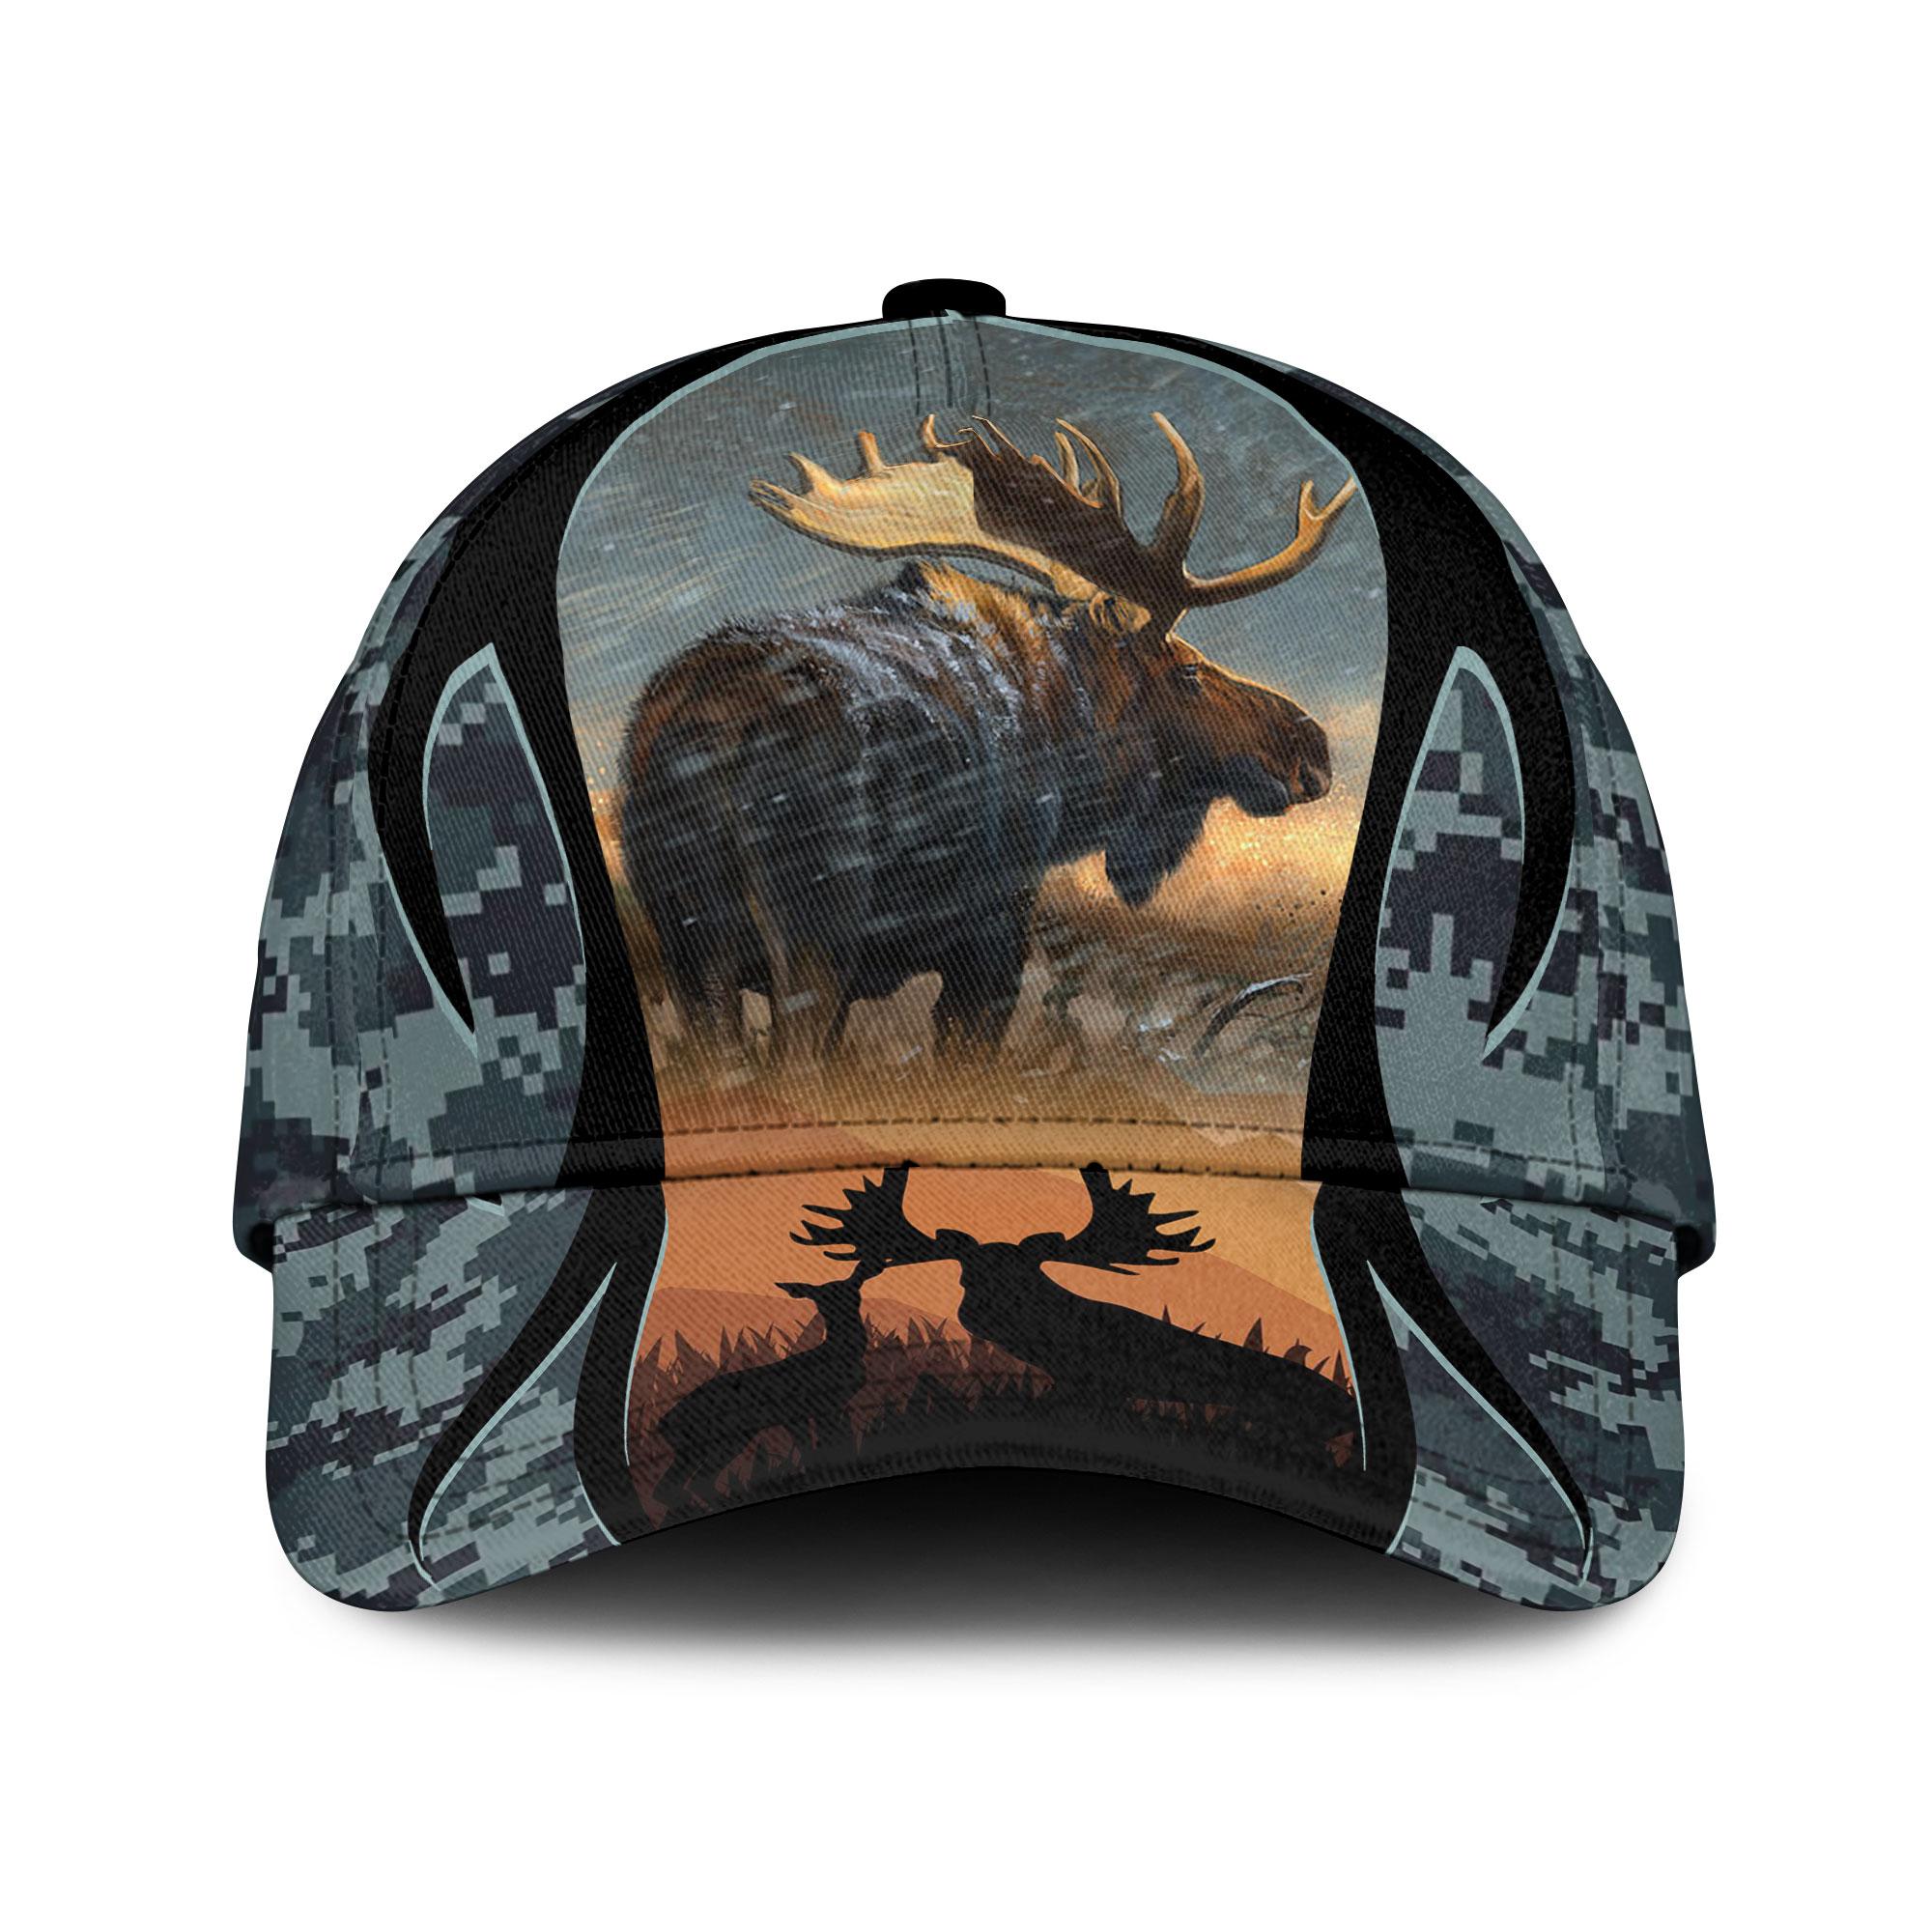 Love Moose Hunting Camouflage Sku 152 Classic Cap